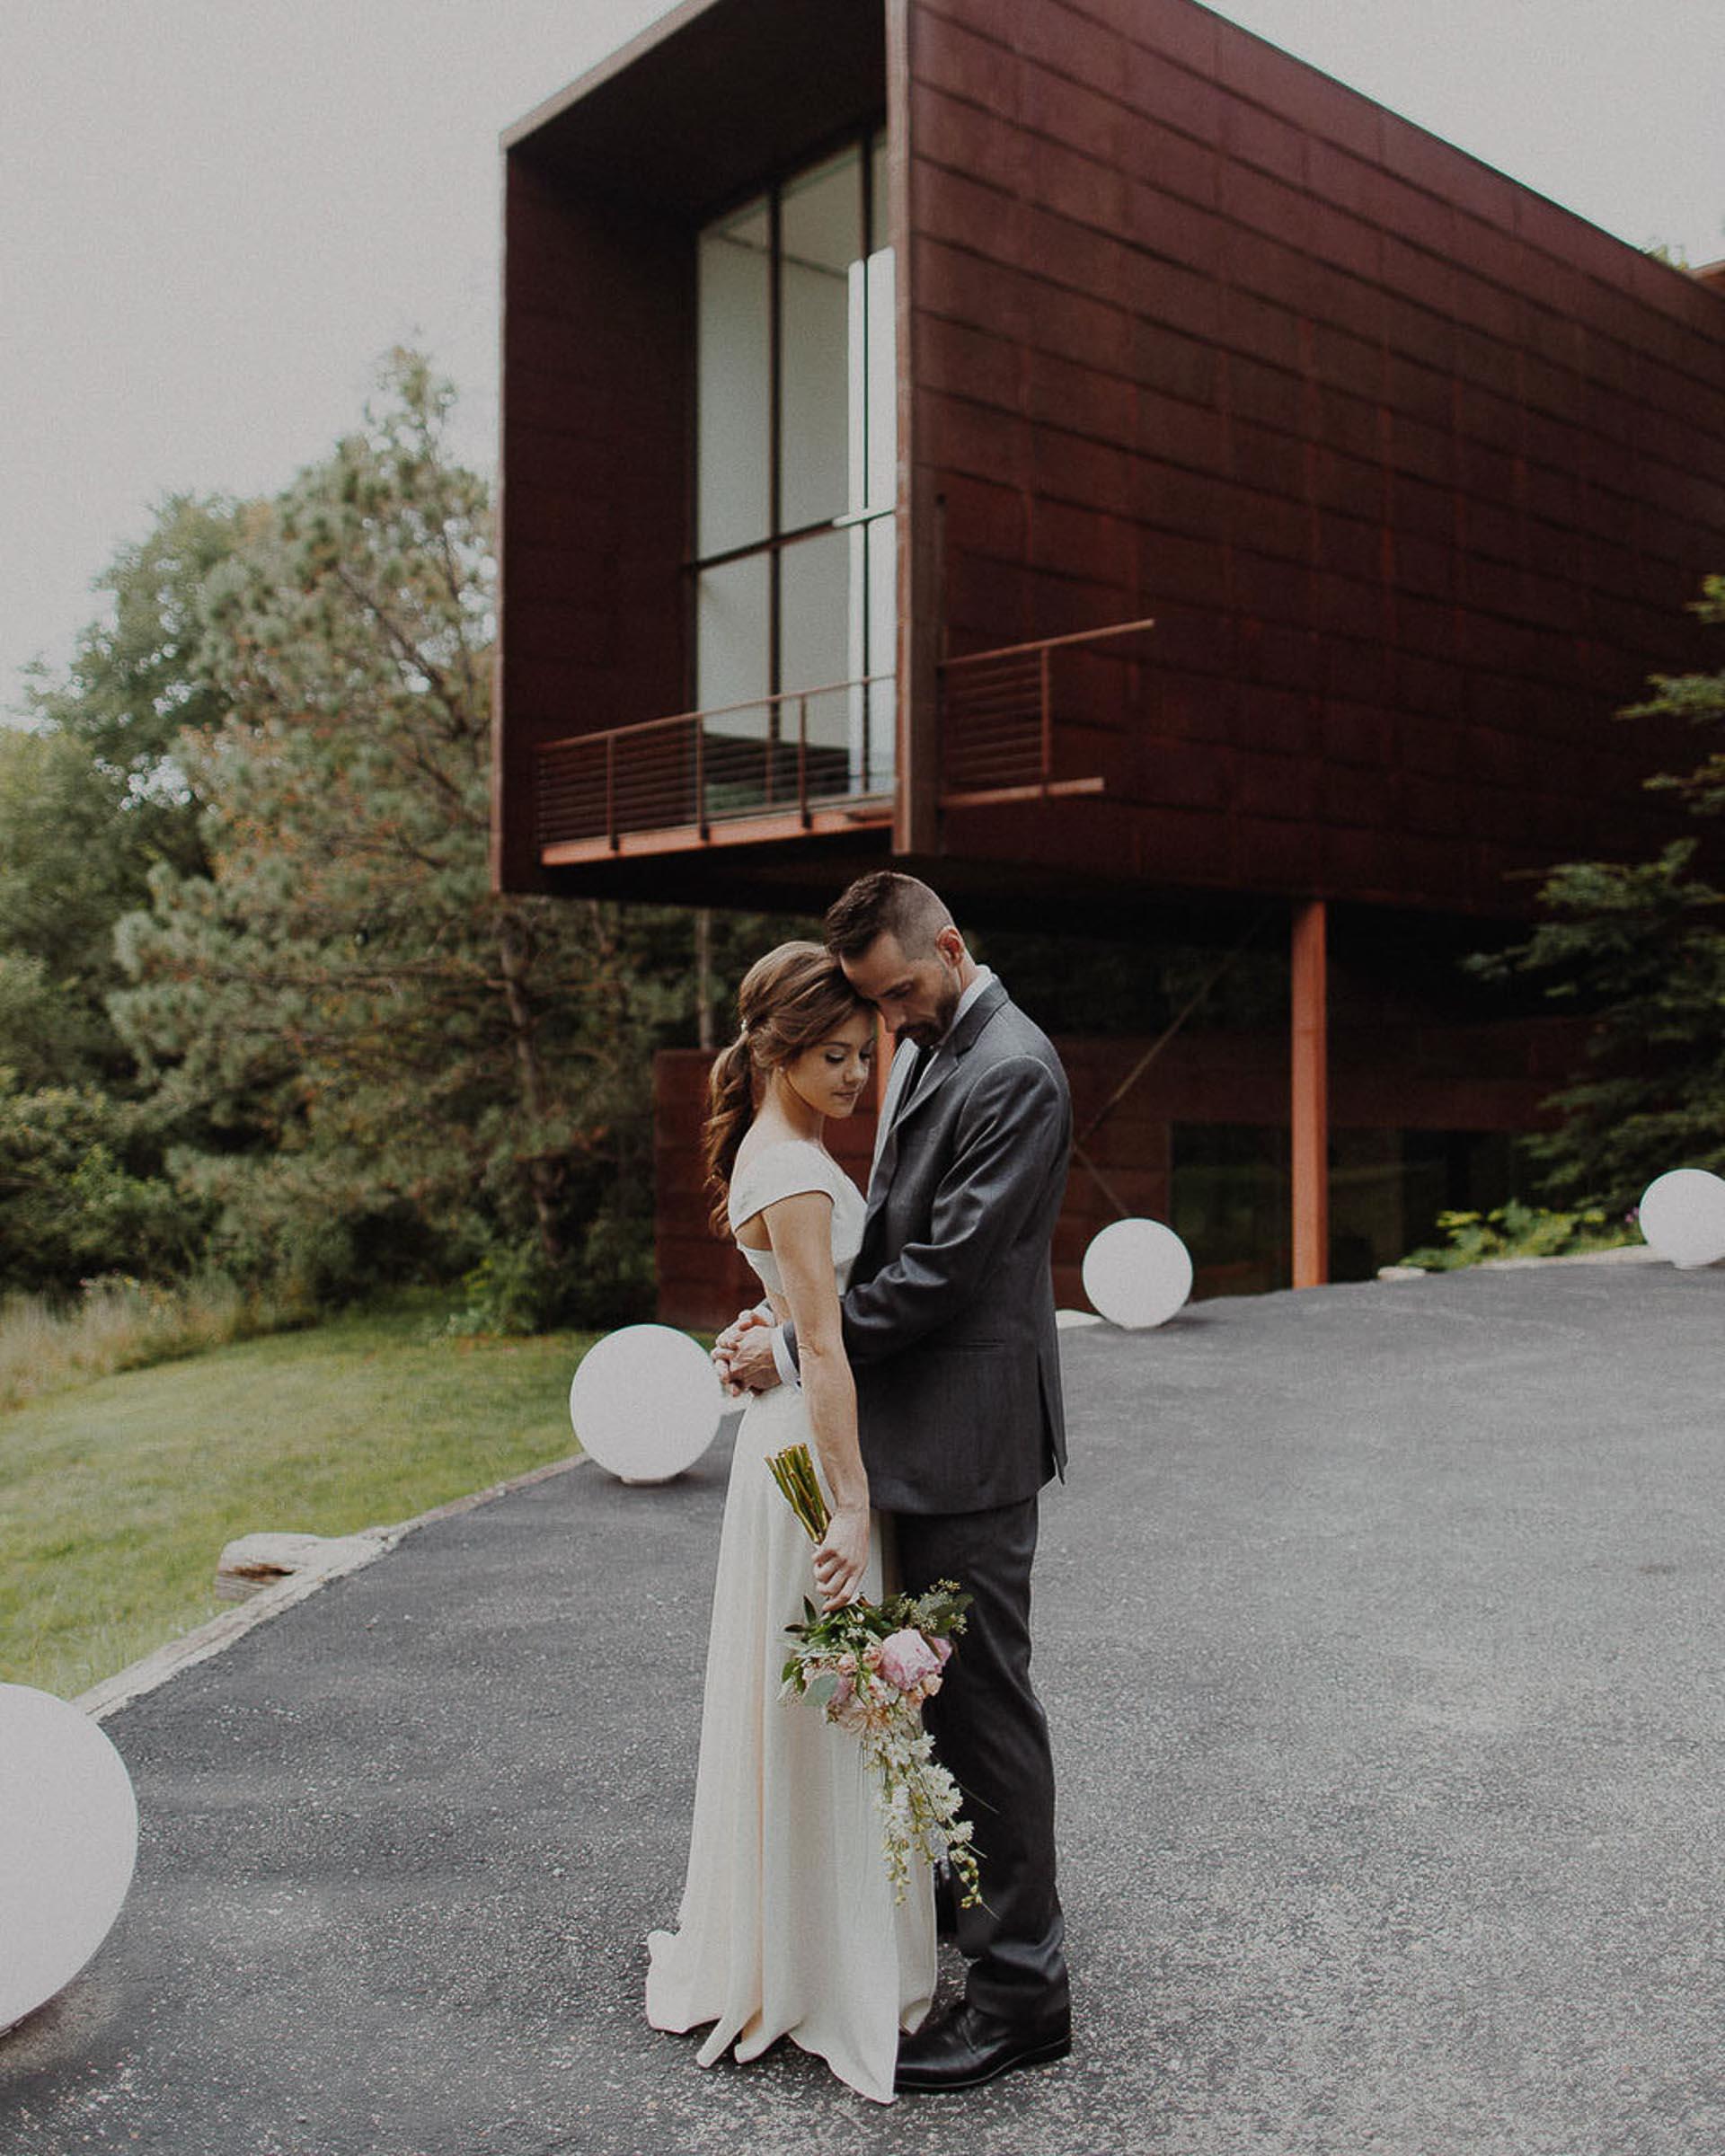 Daniel + Jackie  Modern Wedding at The Laboratory House in Omaha, Nebraska Wedding     VIEW